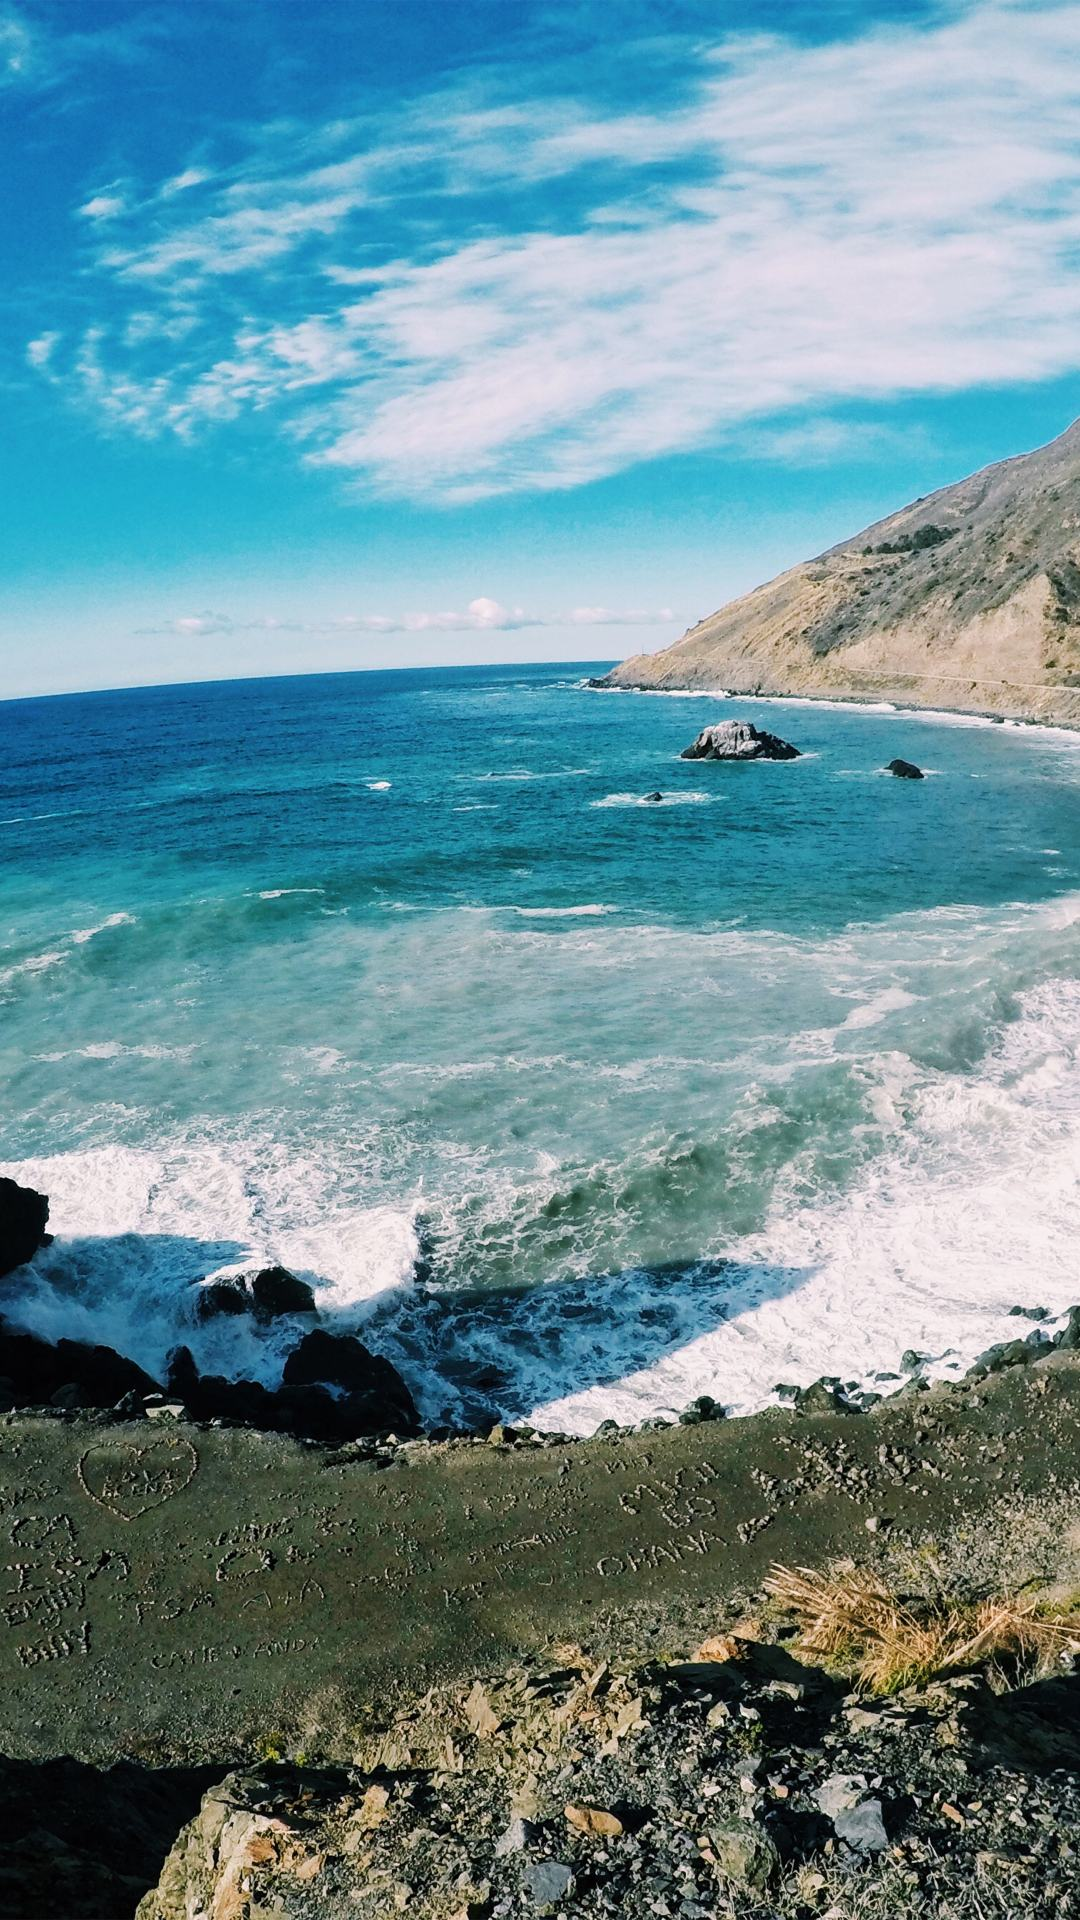 California Coast iPhone Wallpaper - iDrop News